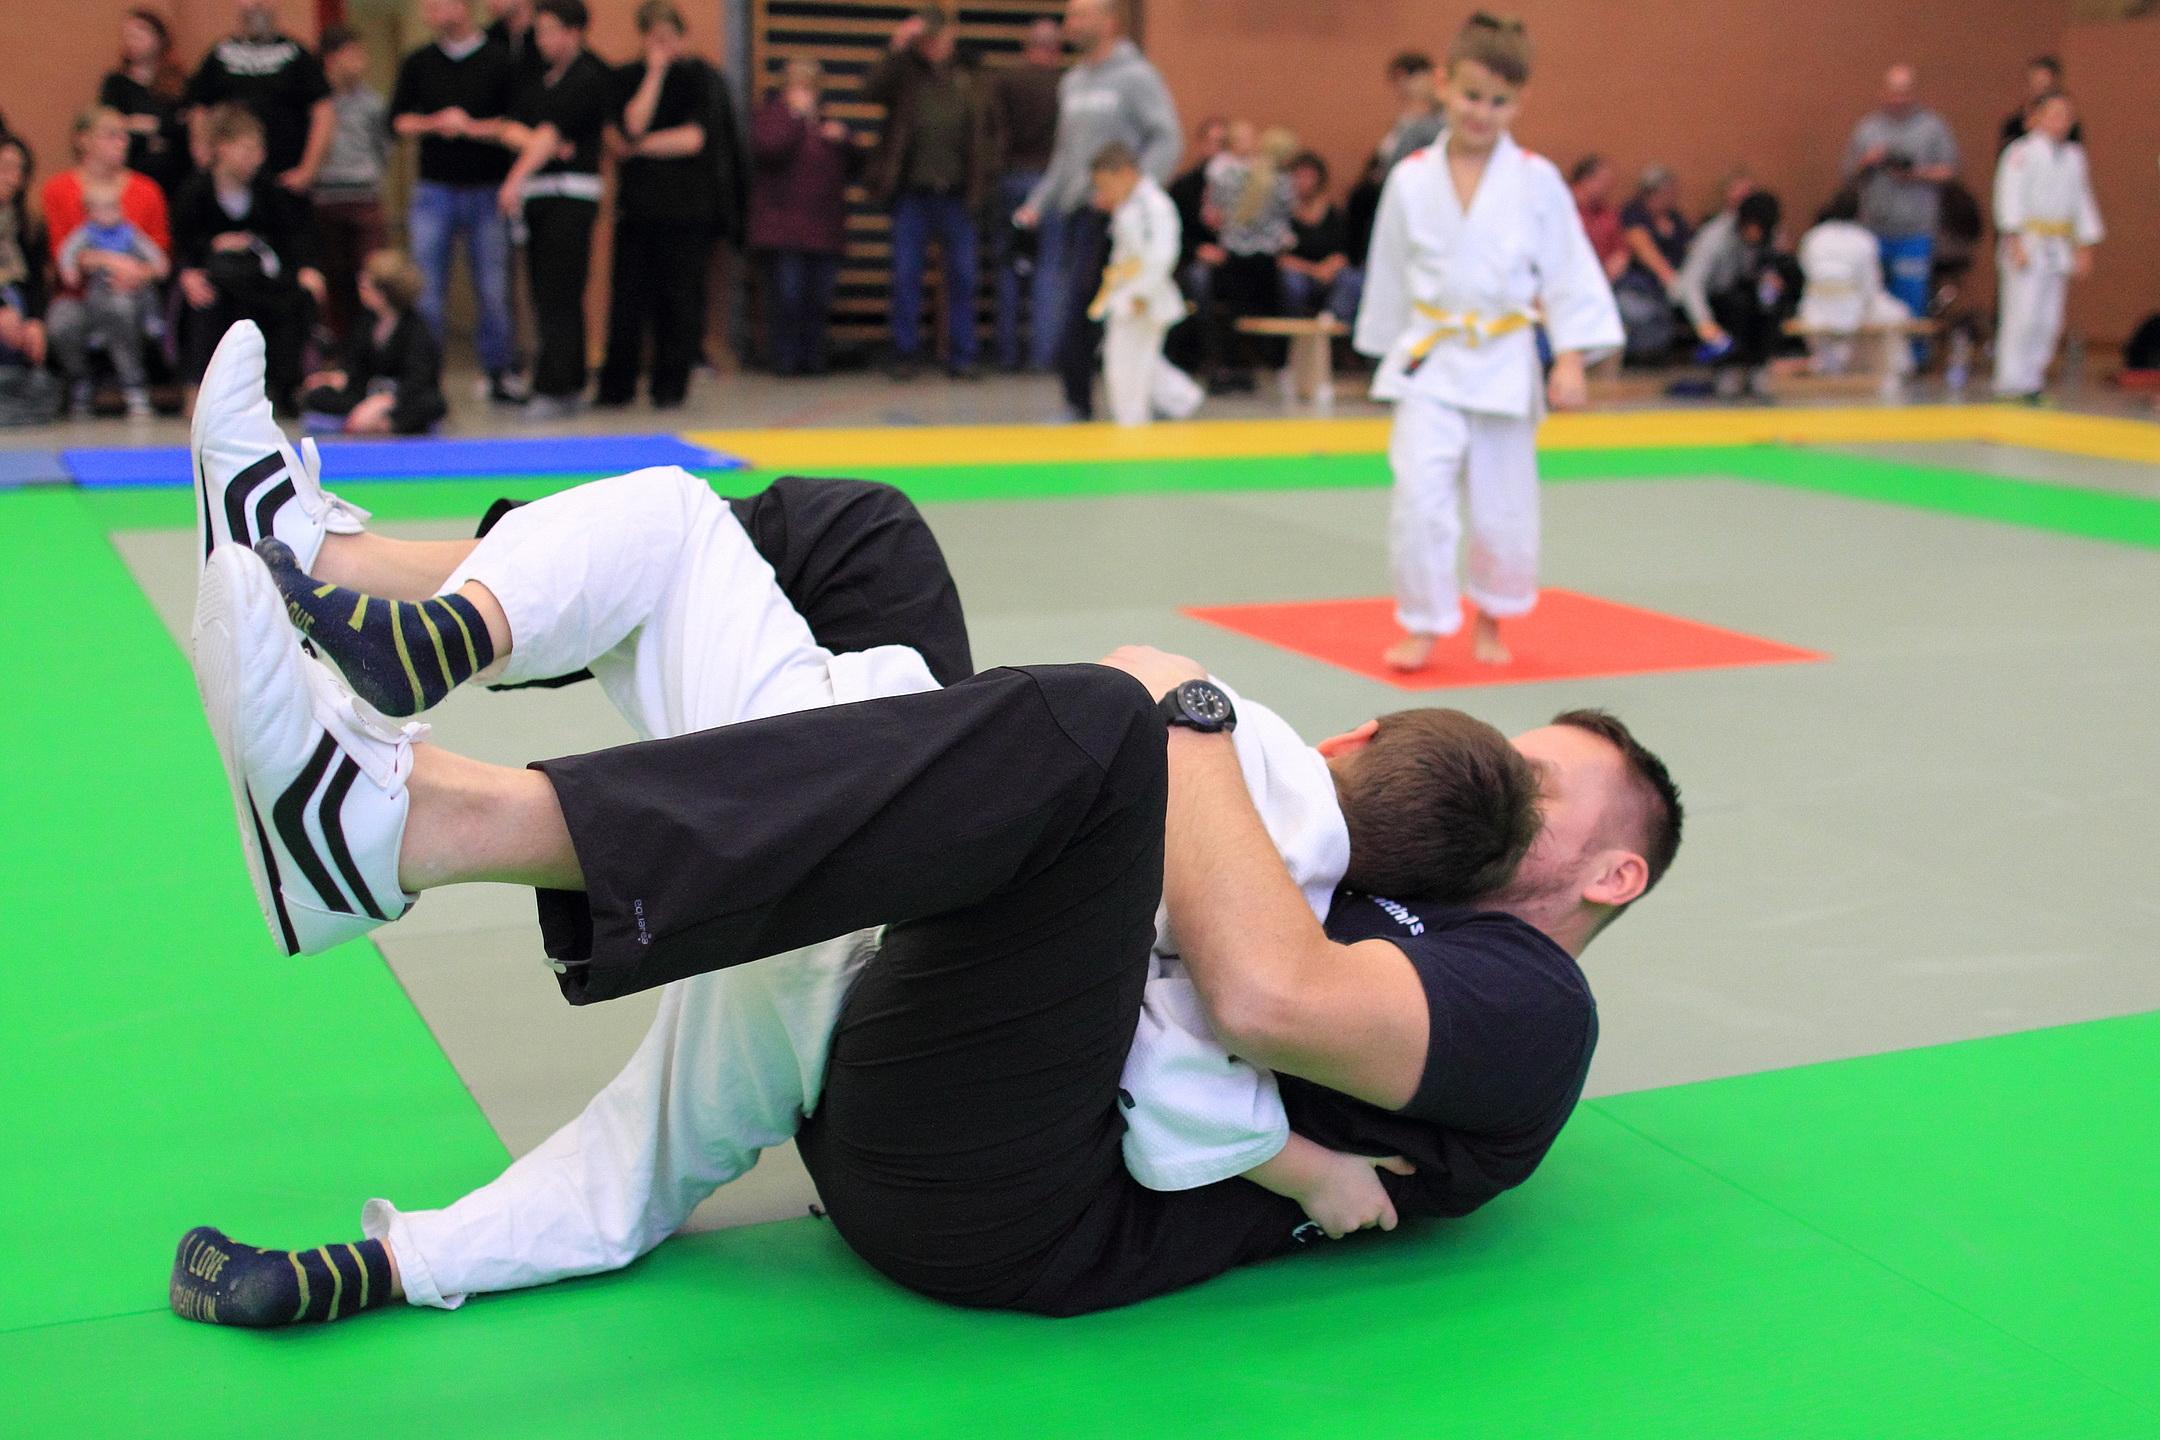 2016-Nikolausturnier Judokas Schwedt (11)